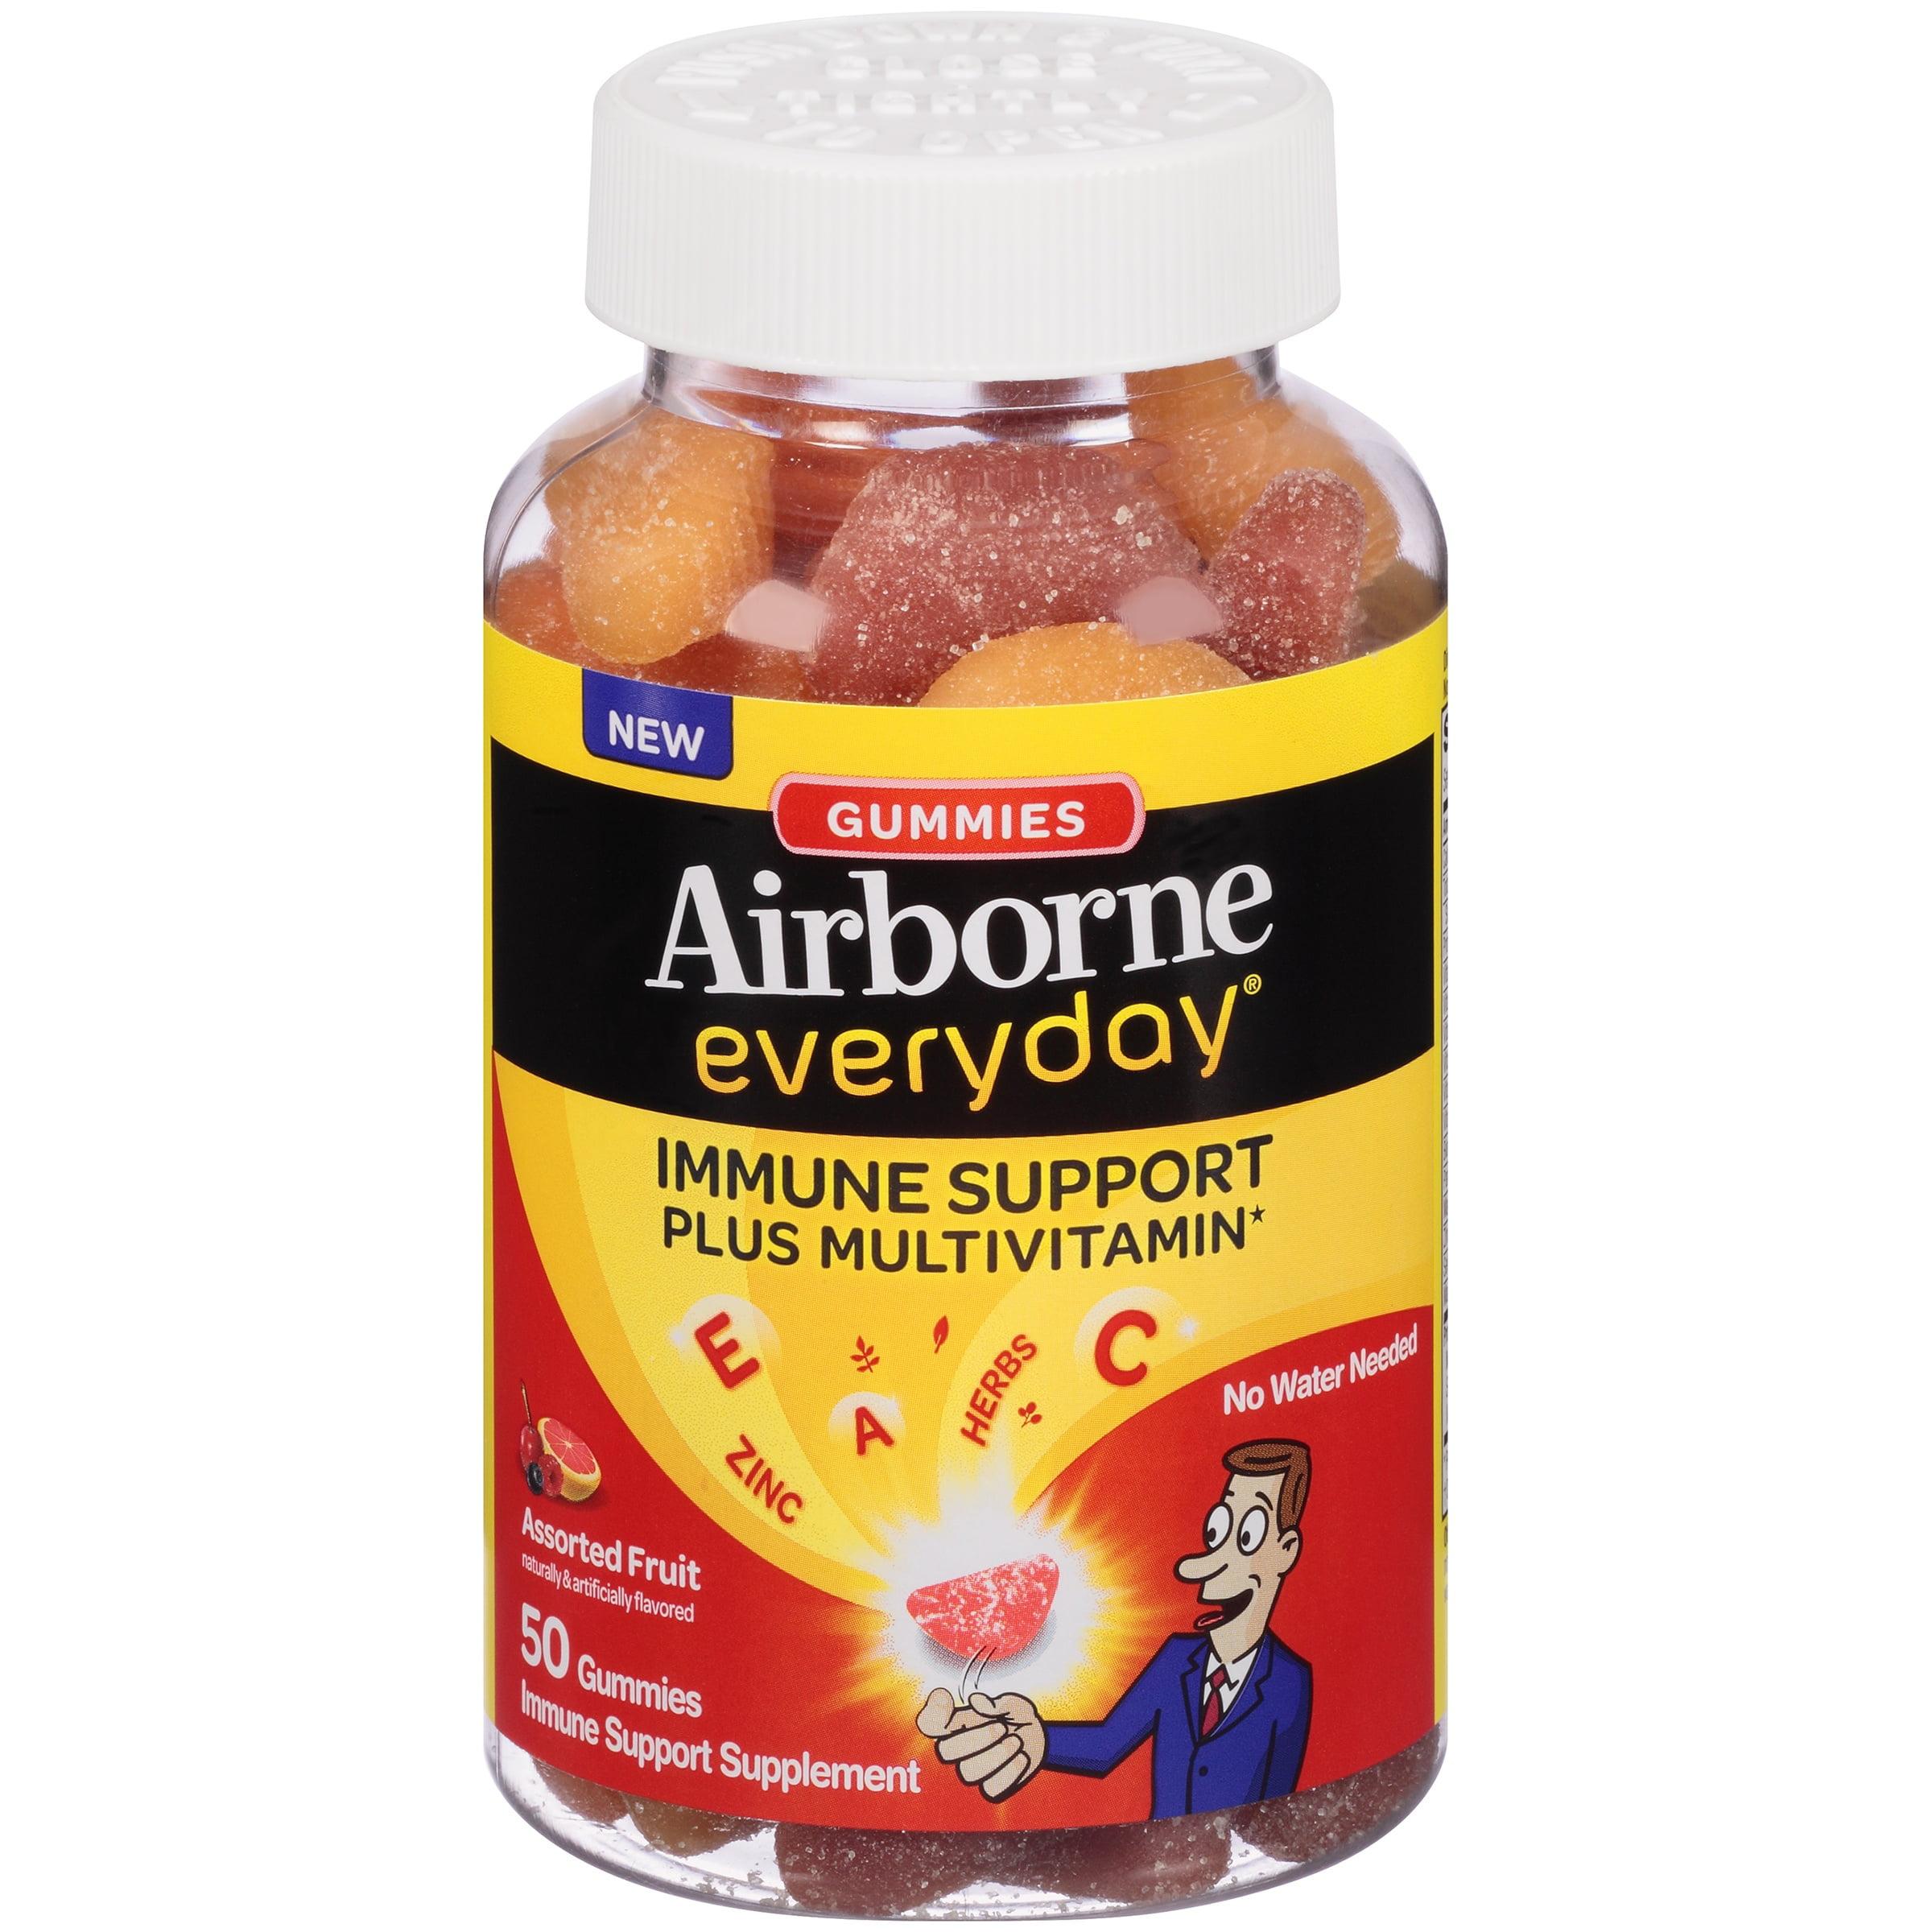 Watch Airborne Kids Gummies Reviews video